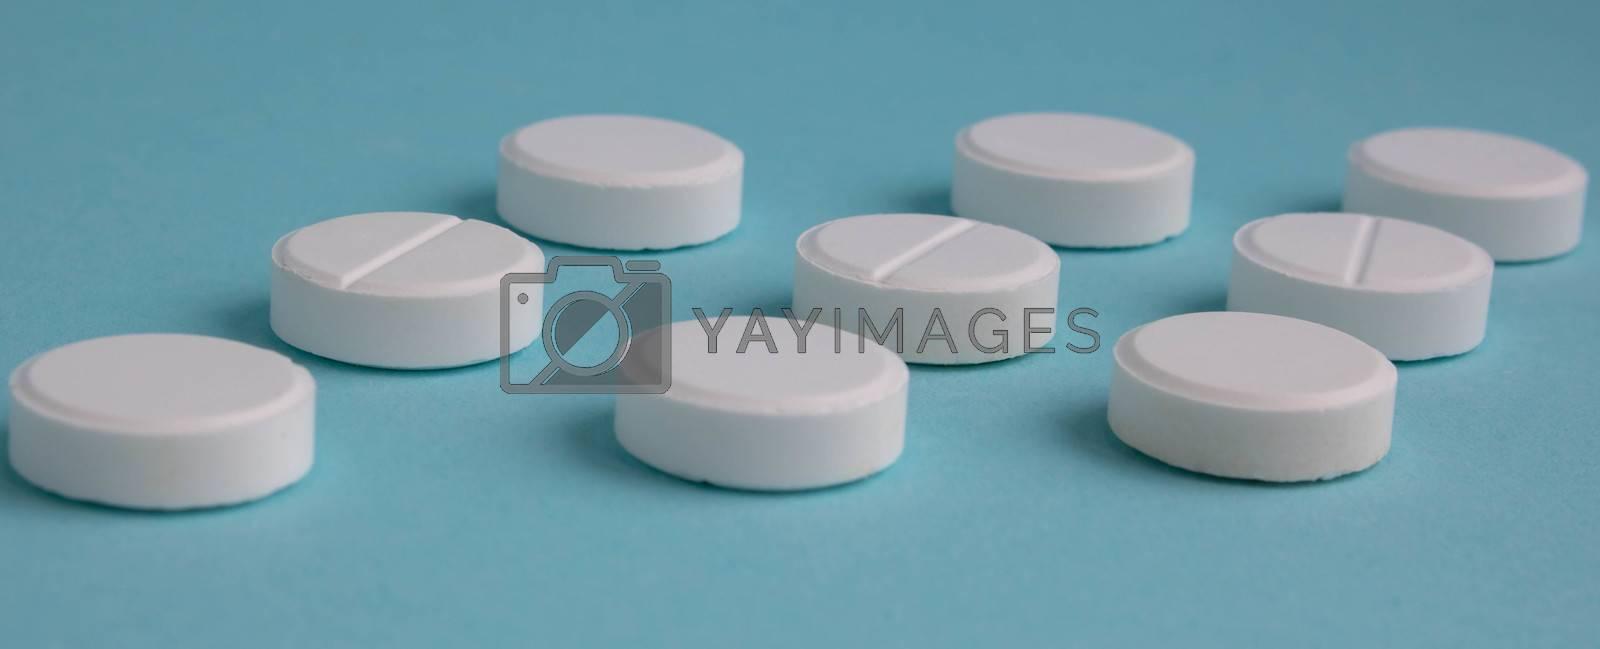 tablets from pharmaceuticals antibiotics medicine tablets antibacterial tablets